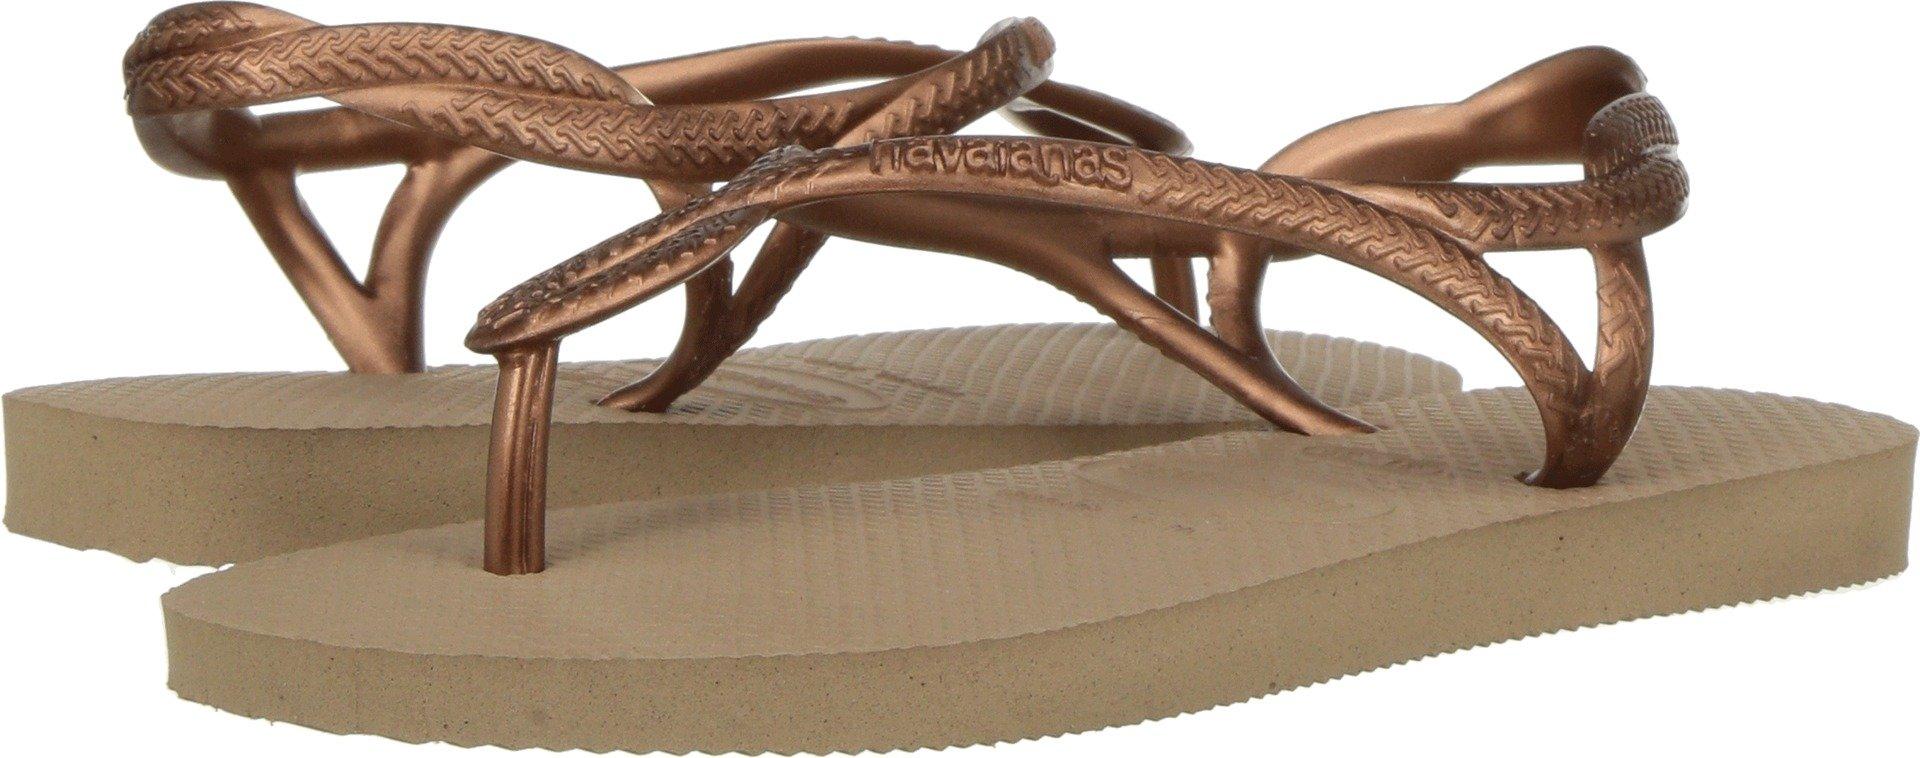 Havaianas Kids Girl's Luna Sandals (Little Kid/Big Kid) Rose Gold 31-32 M EU